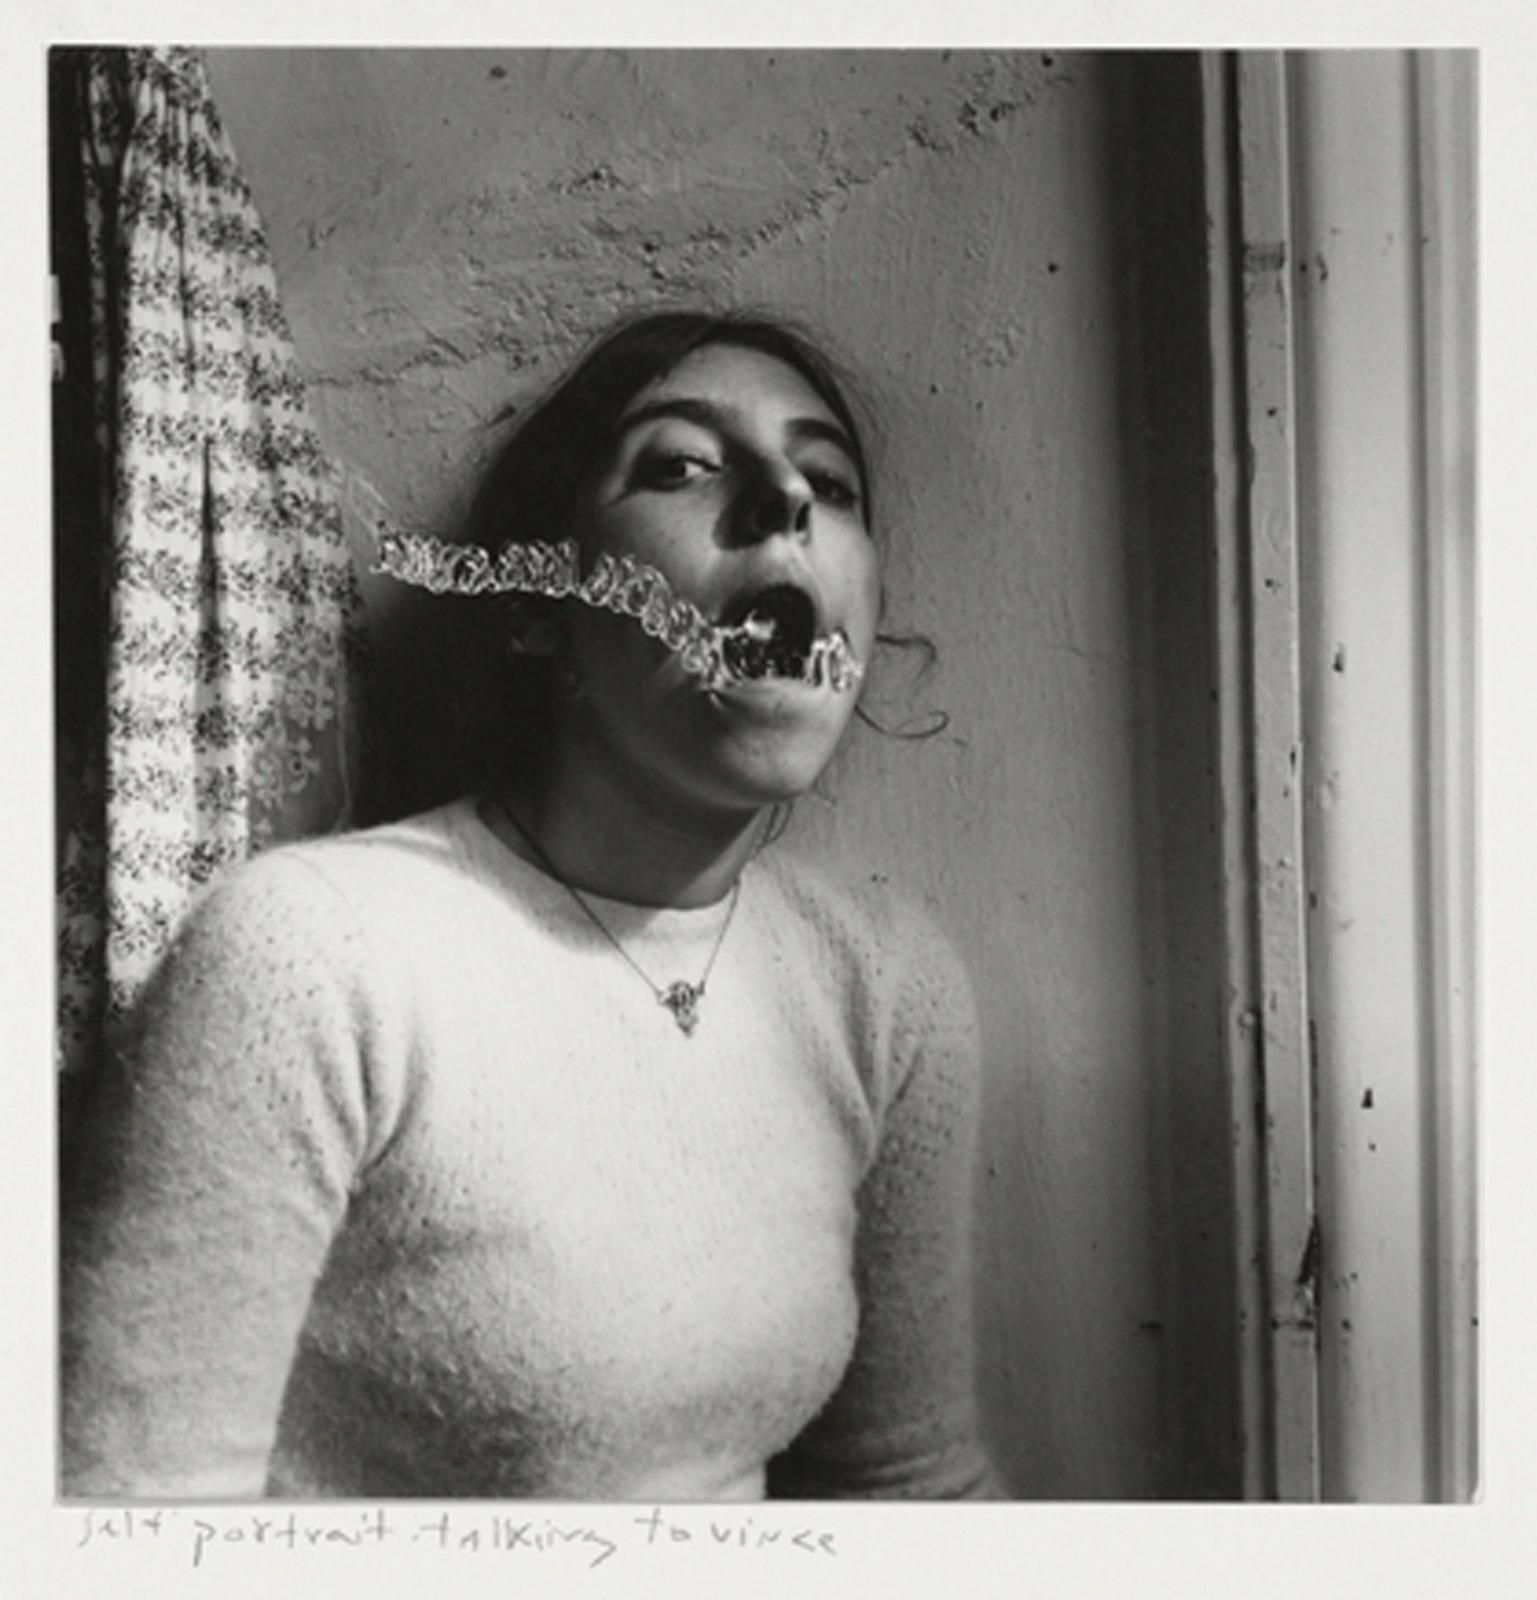 Francesca Woodman, Self-portrait talking to Vince, Providence, Rhode Island, 1977 © George and Betty Woodman